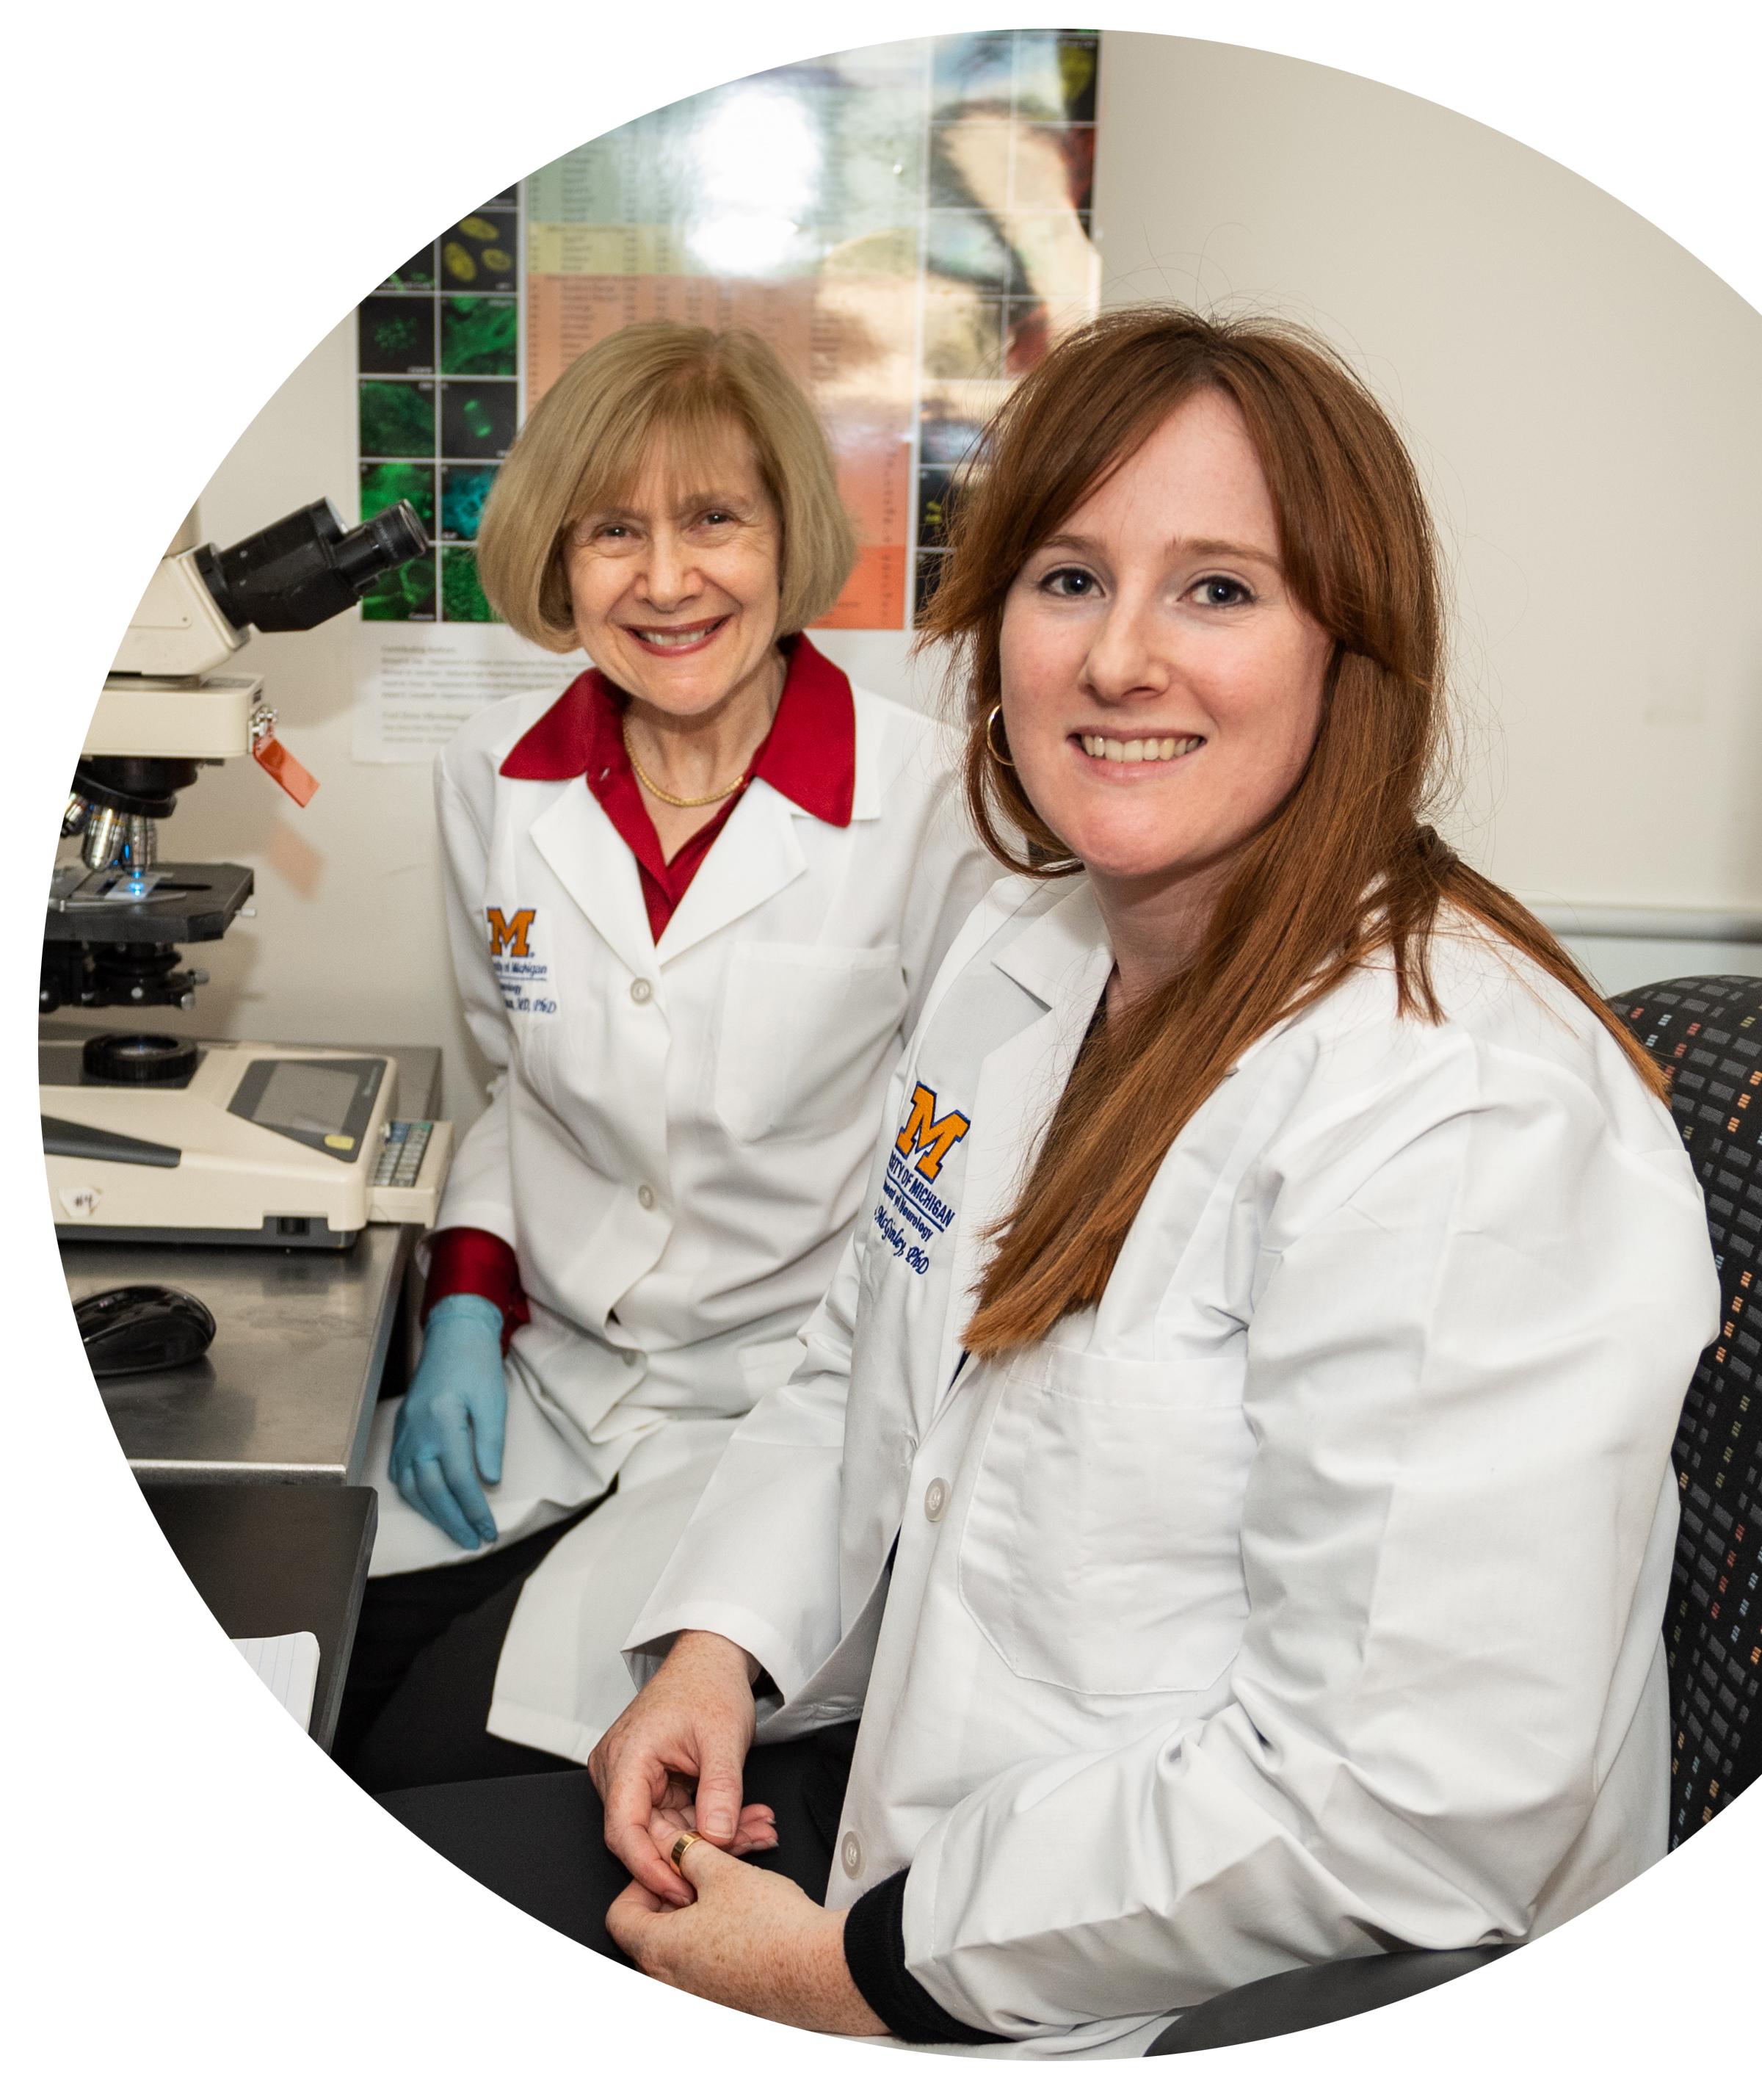 Drs. Eva Feldman and Lisa McGinley